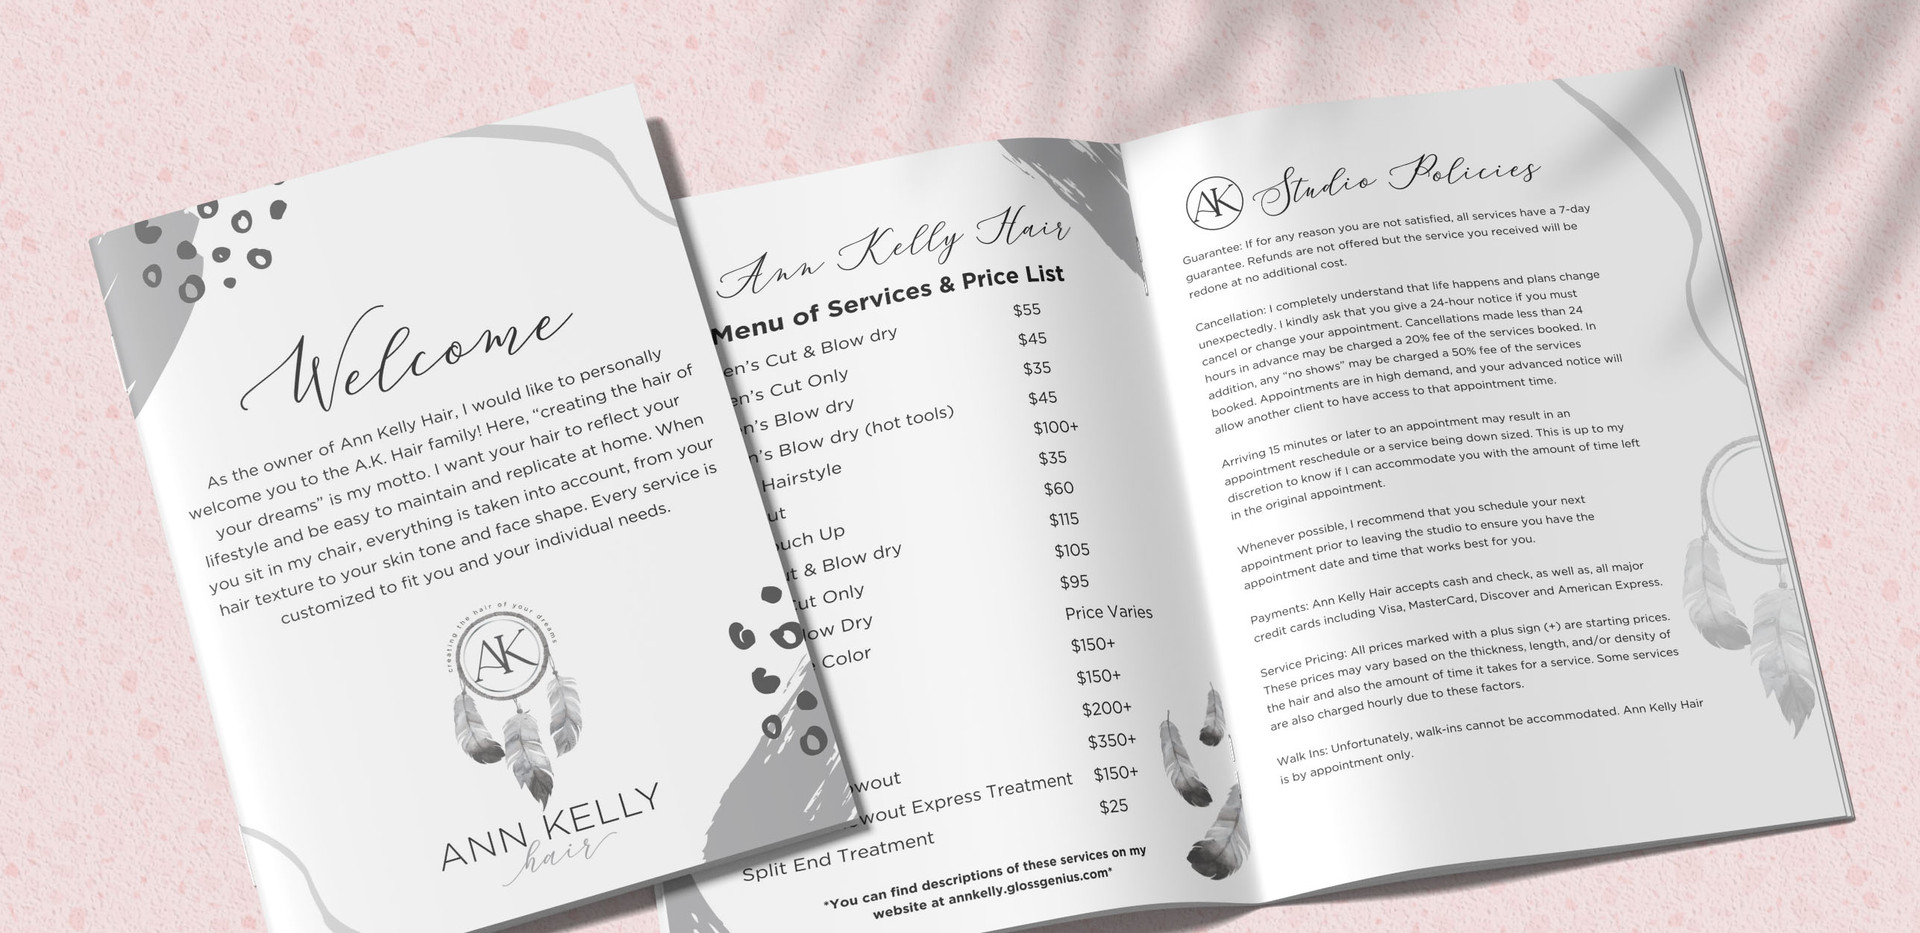 Ann Kelly Hair Pricing Packet